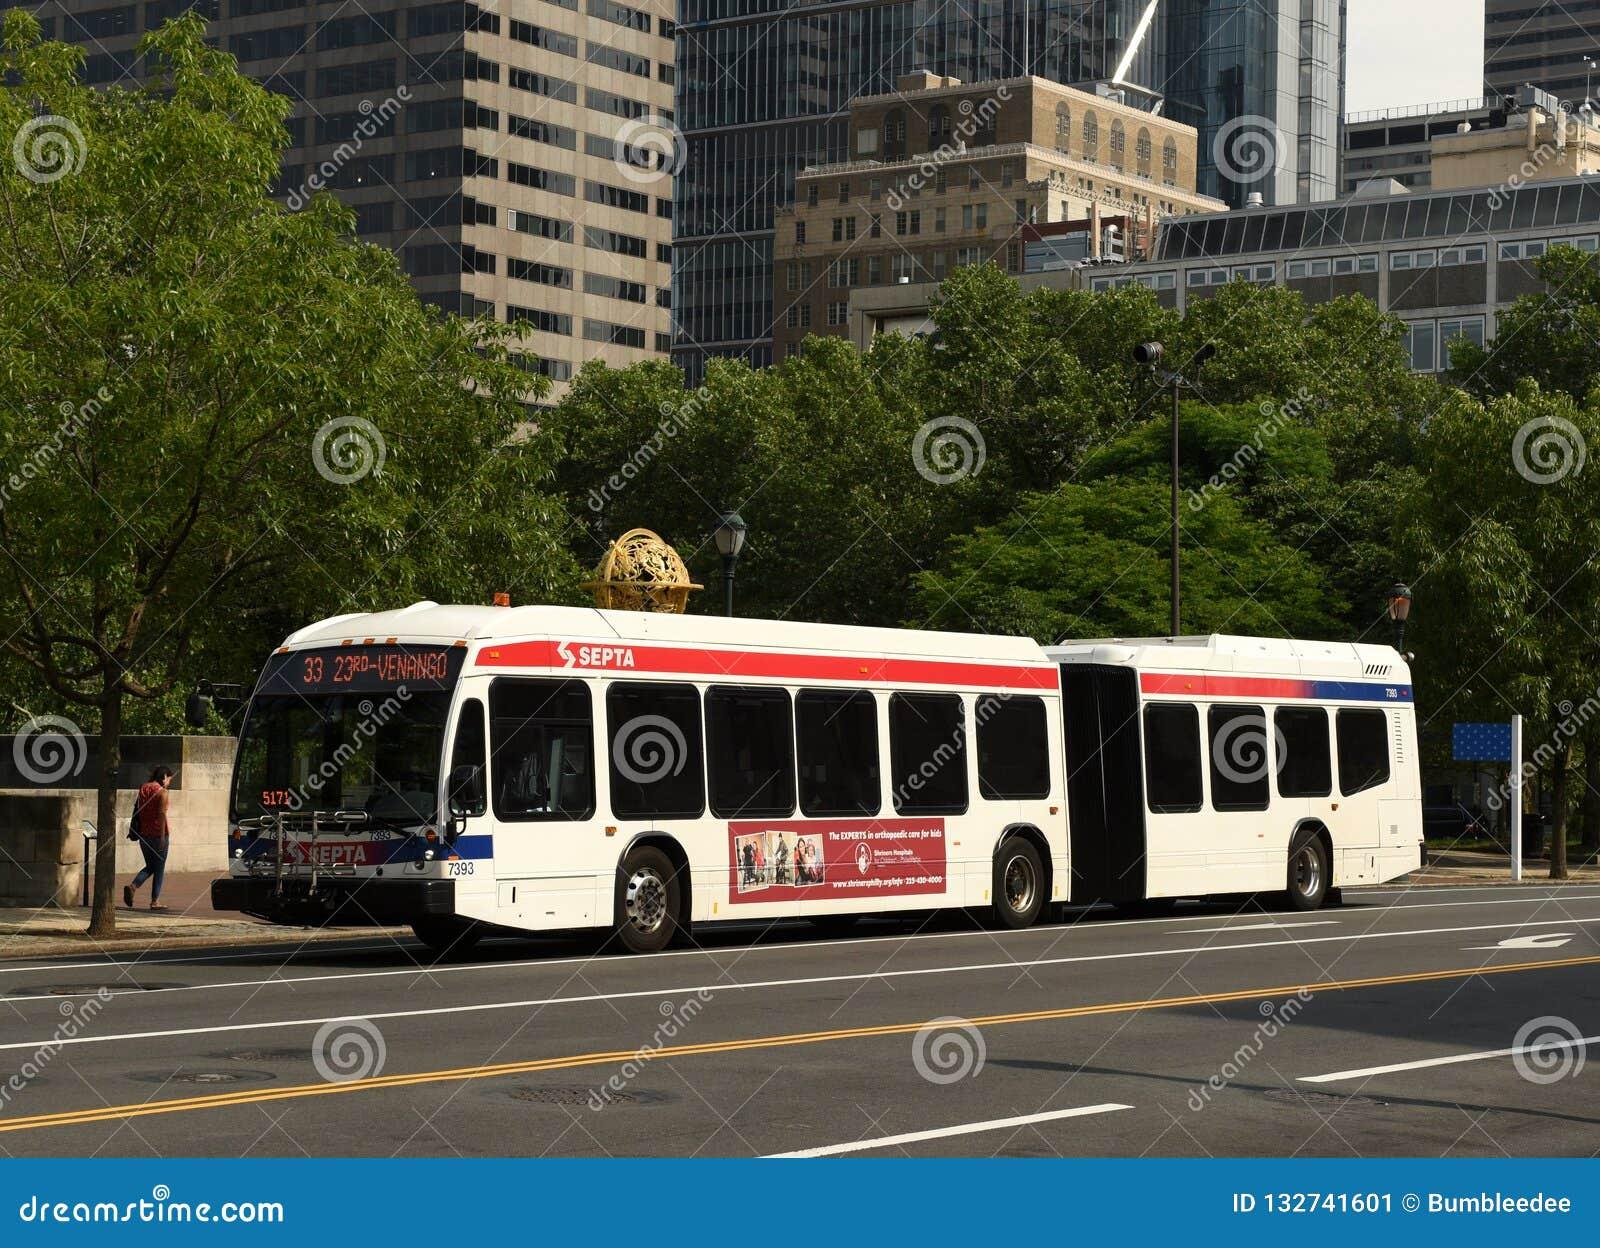 Philadelphia, de V.S. - 29 Mei, 2018: Bus binnen de stad in van Philadelphi